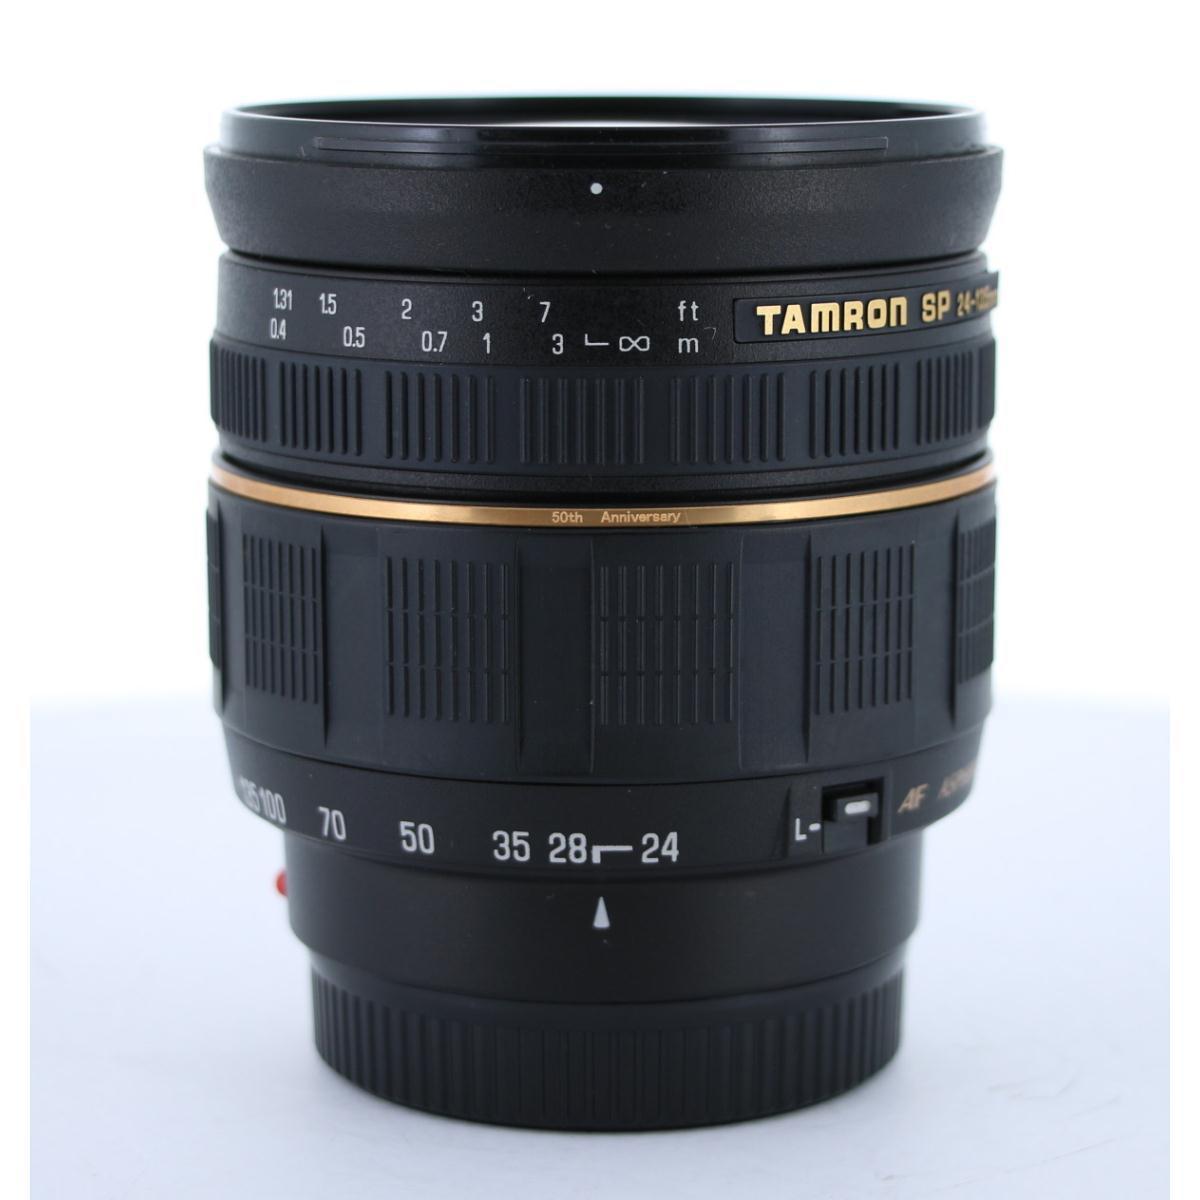 TAMRON α24-135mm F3.5-5.6(290D)【中古】